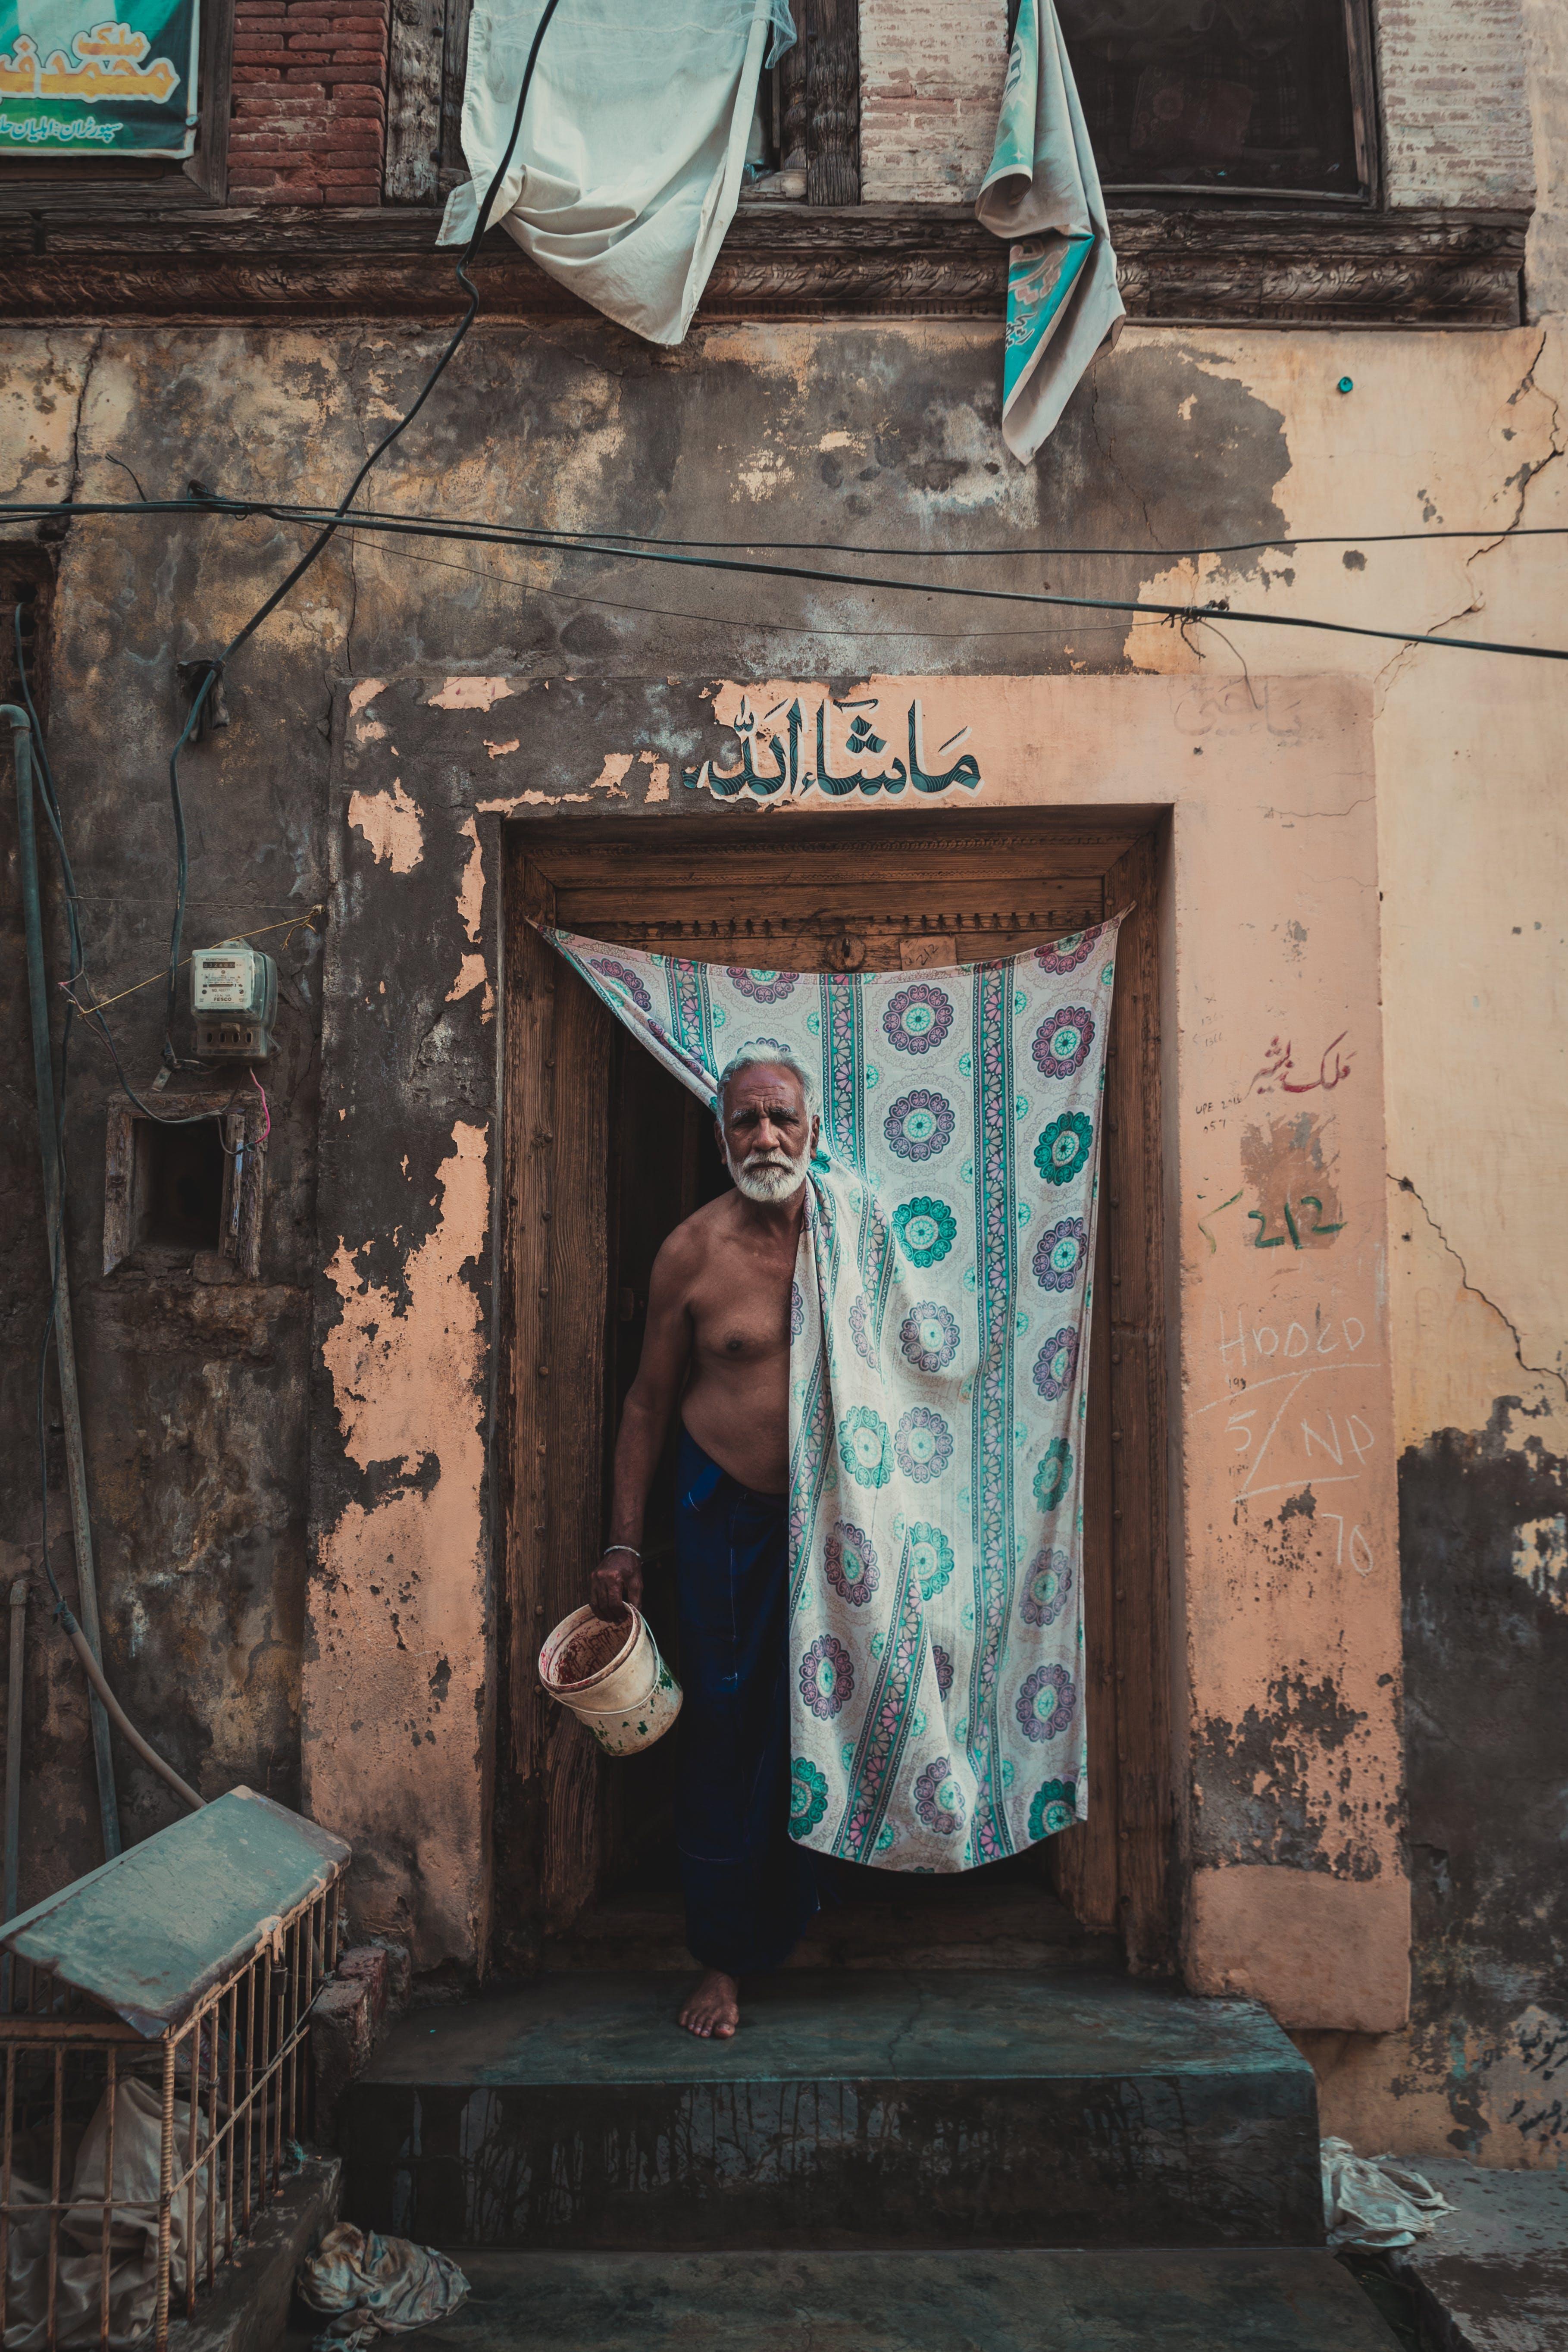 Standing Man Holding Plastic Pail Inside Building